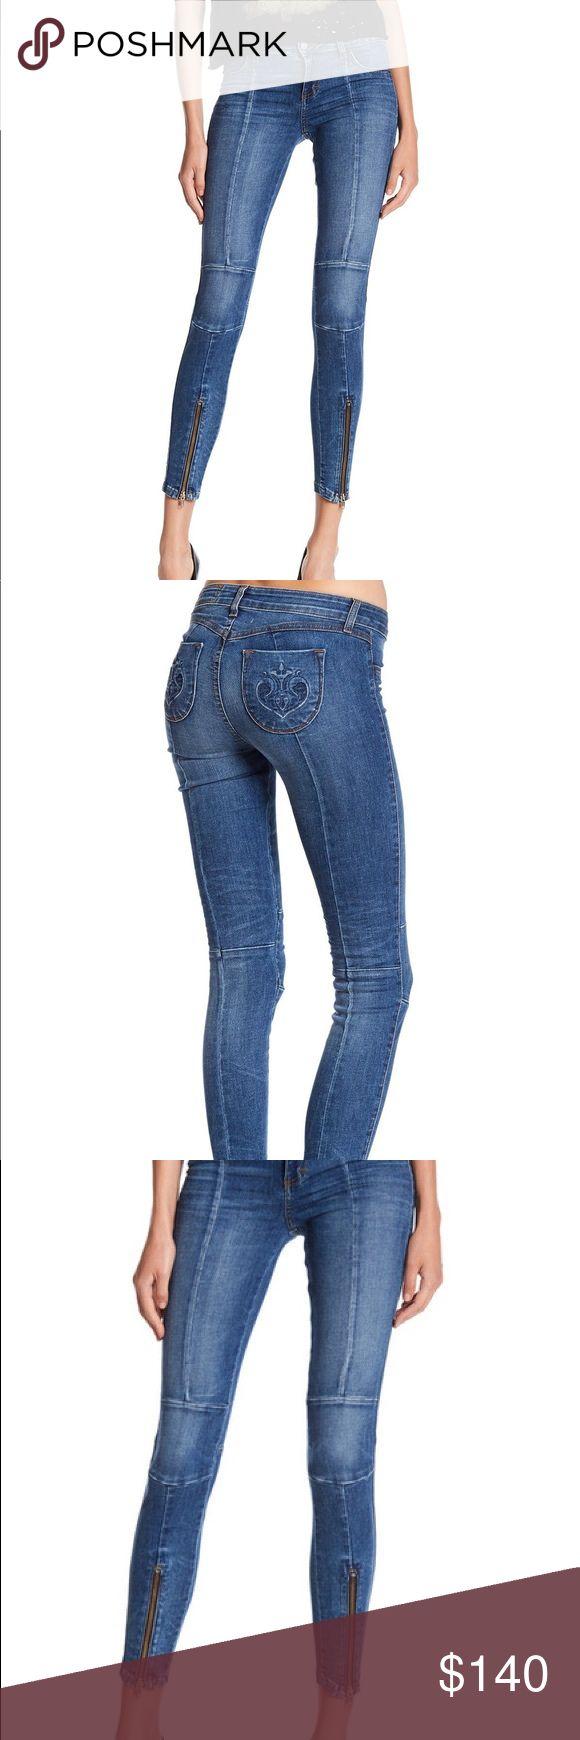 Siwy Zip Up Denim Jeans Worn once, Siwy denim zip up details jeans. Siwy Jeans Skinny